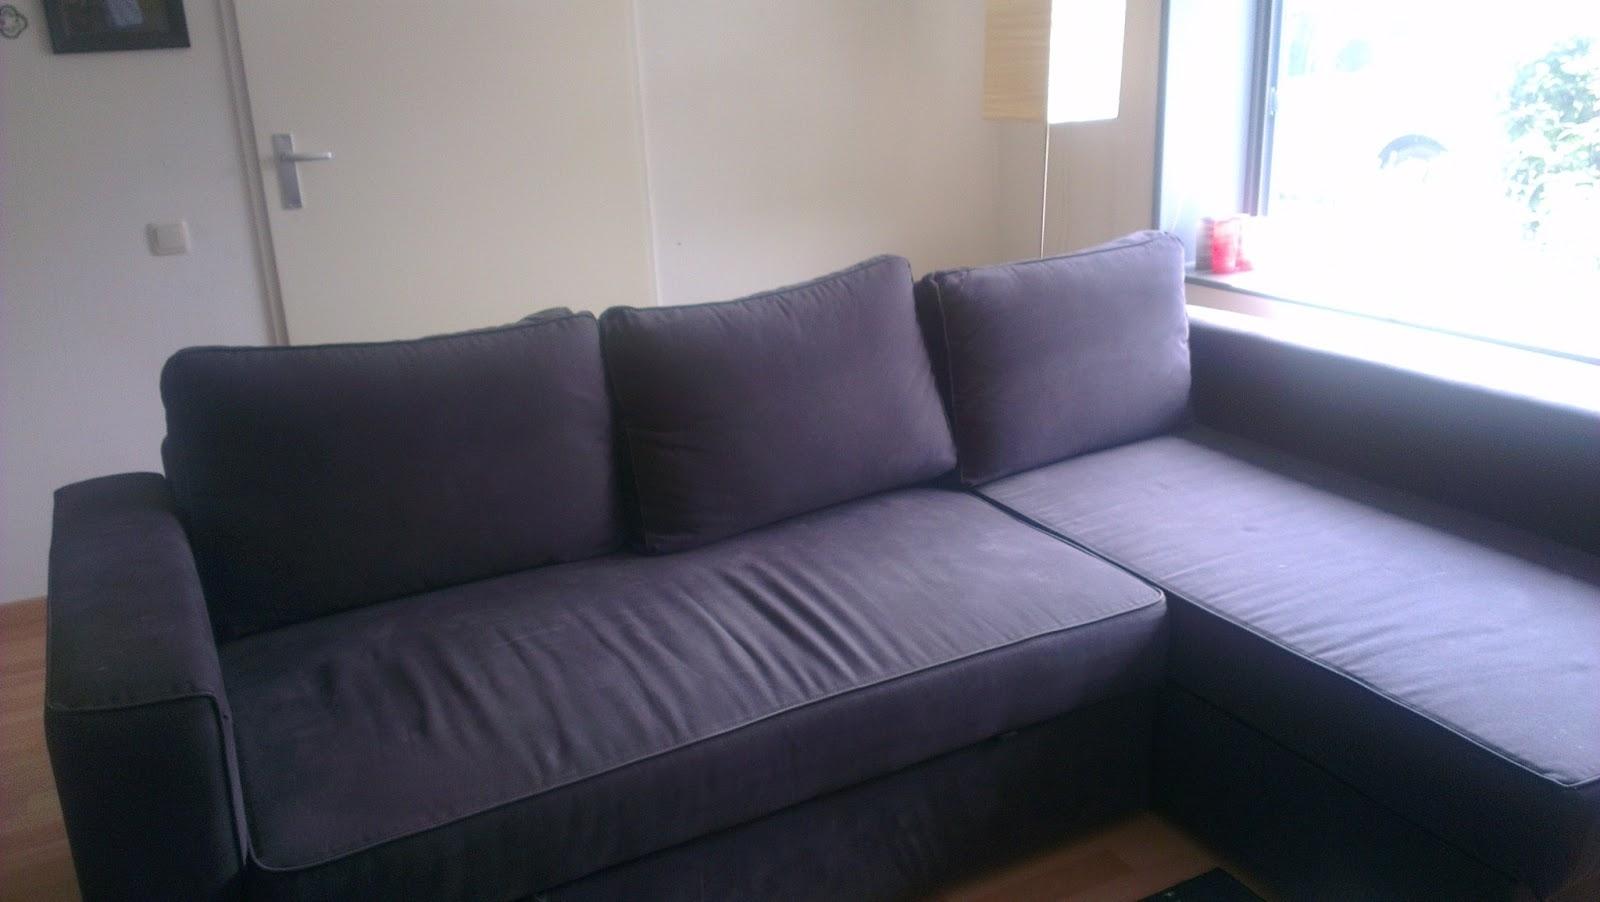 Fashionable Manstad Sofas Inside Ace The Adventure: Ikea Vrijdag: Manstad Bank/sofa (View 5 of 15)